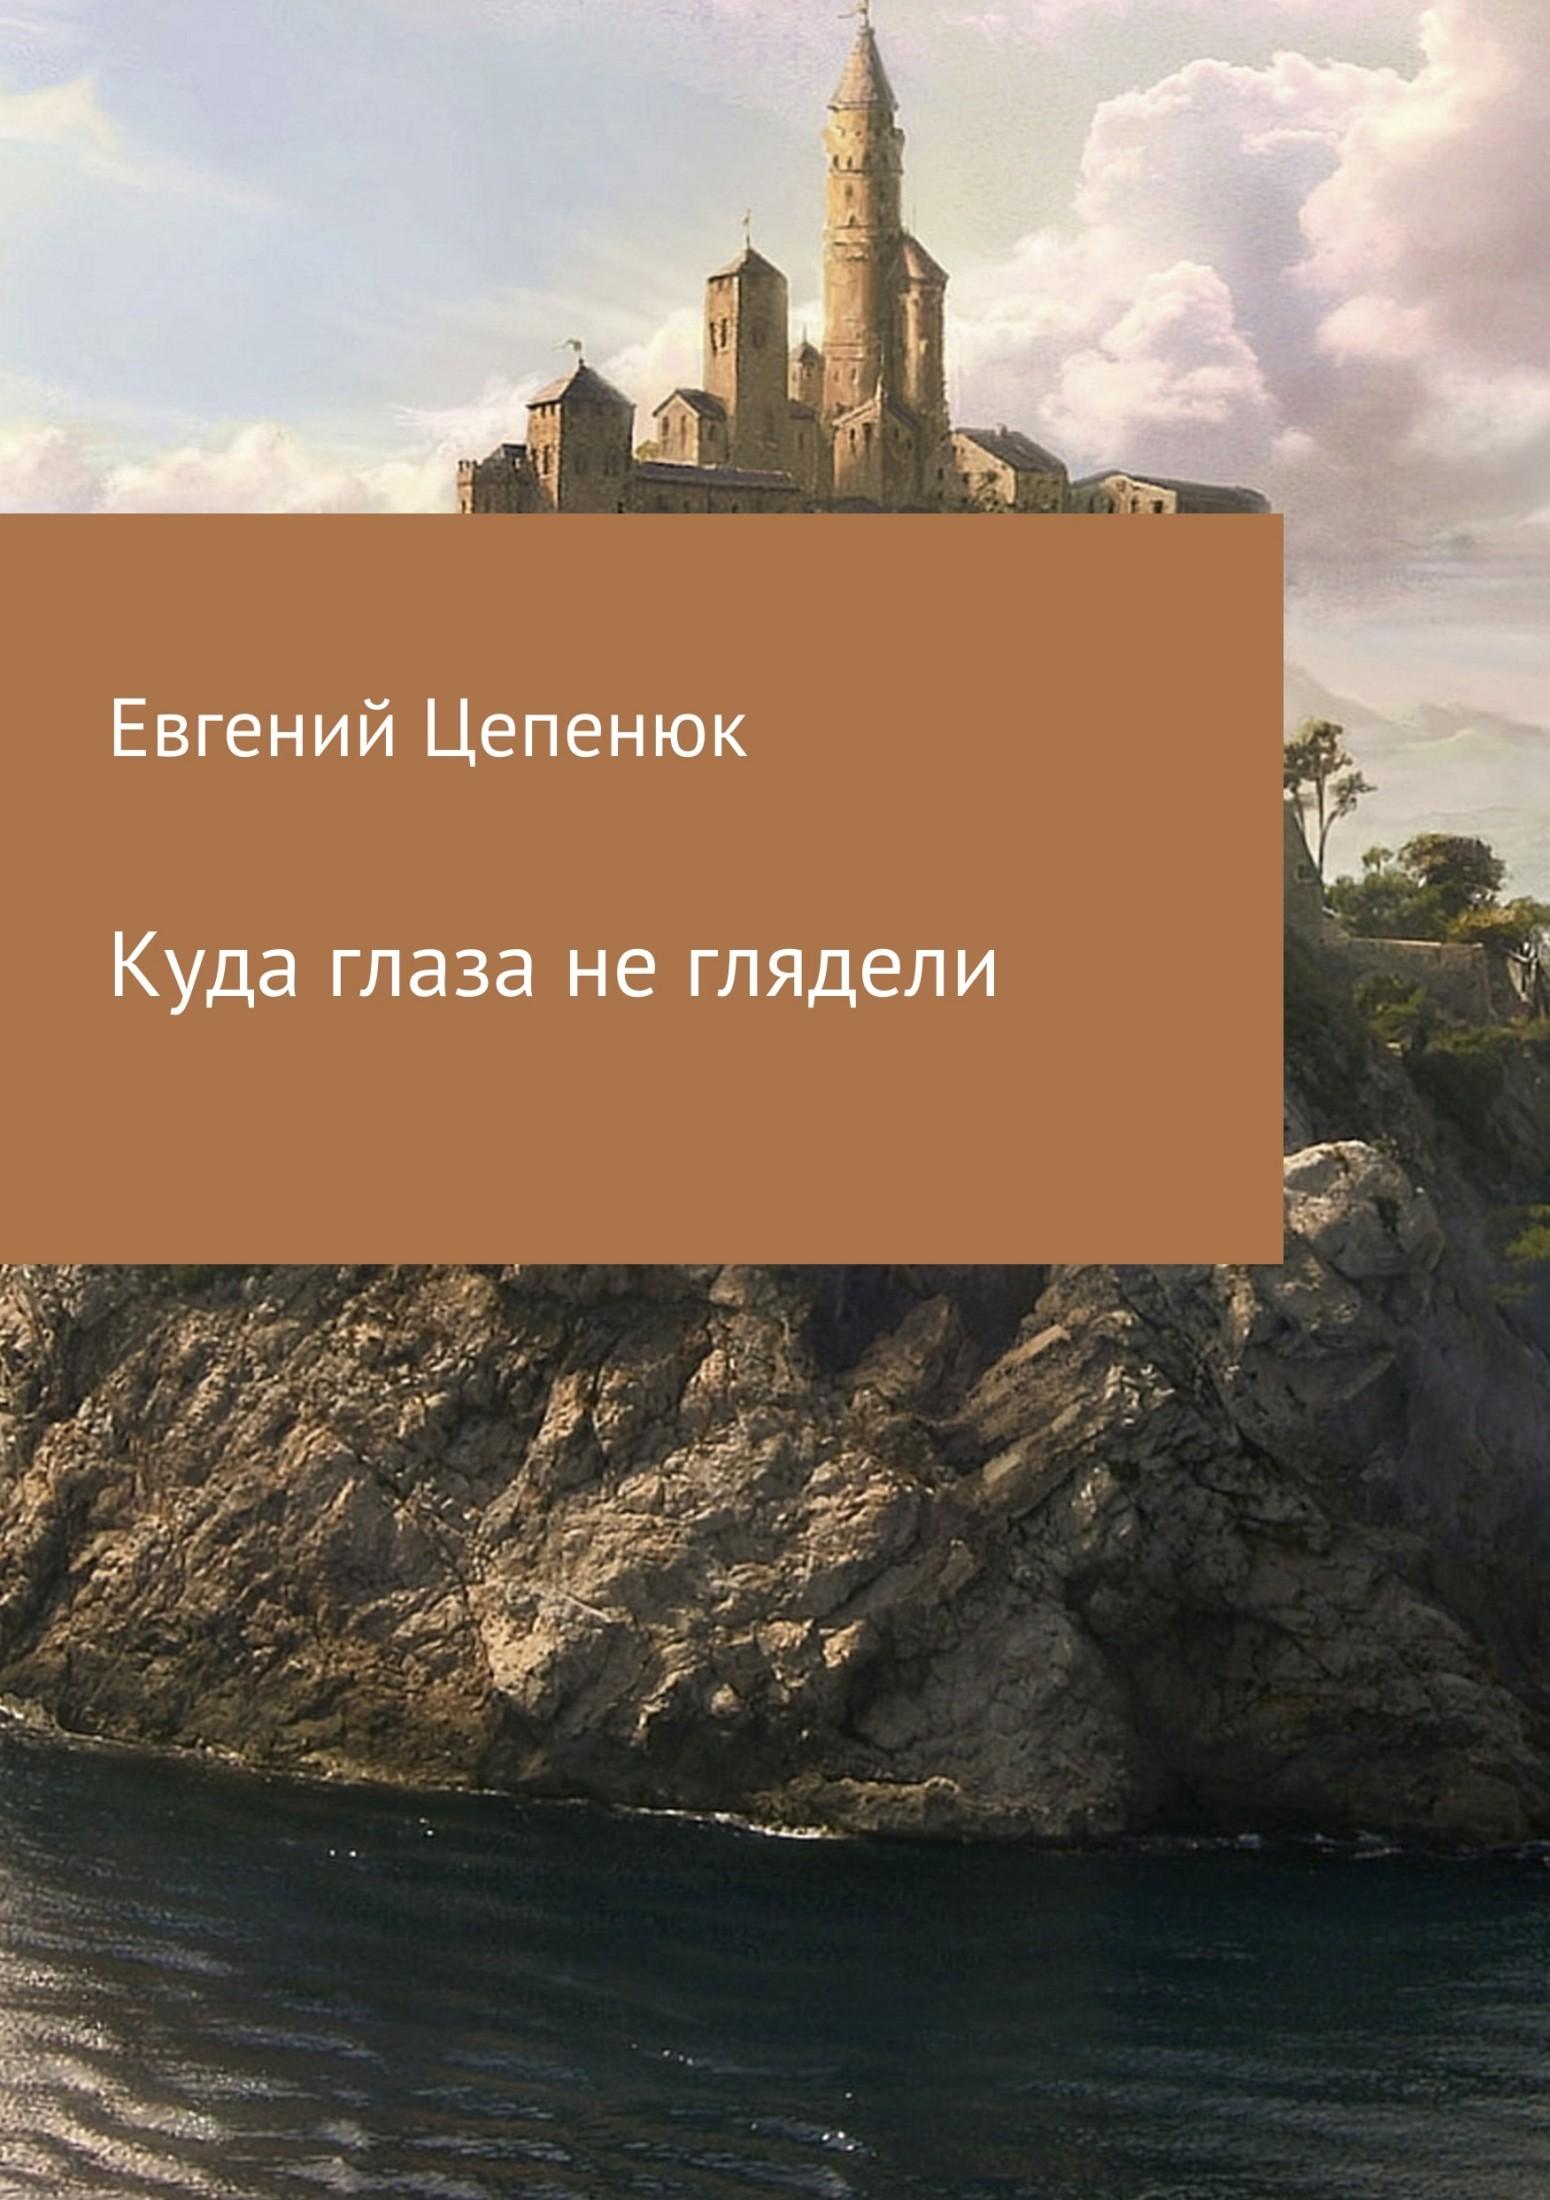 Евгений Цепенюк. Куда глаза не глядели